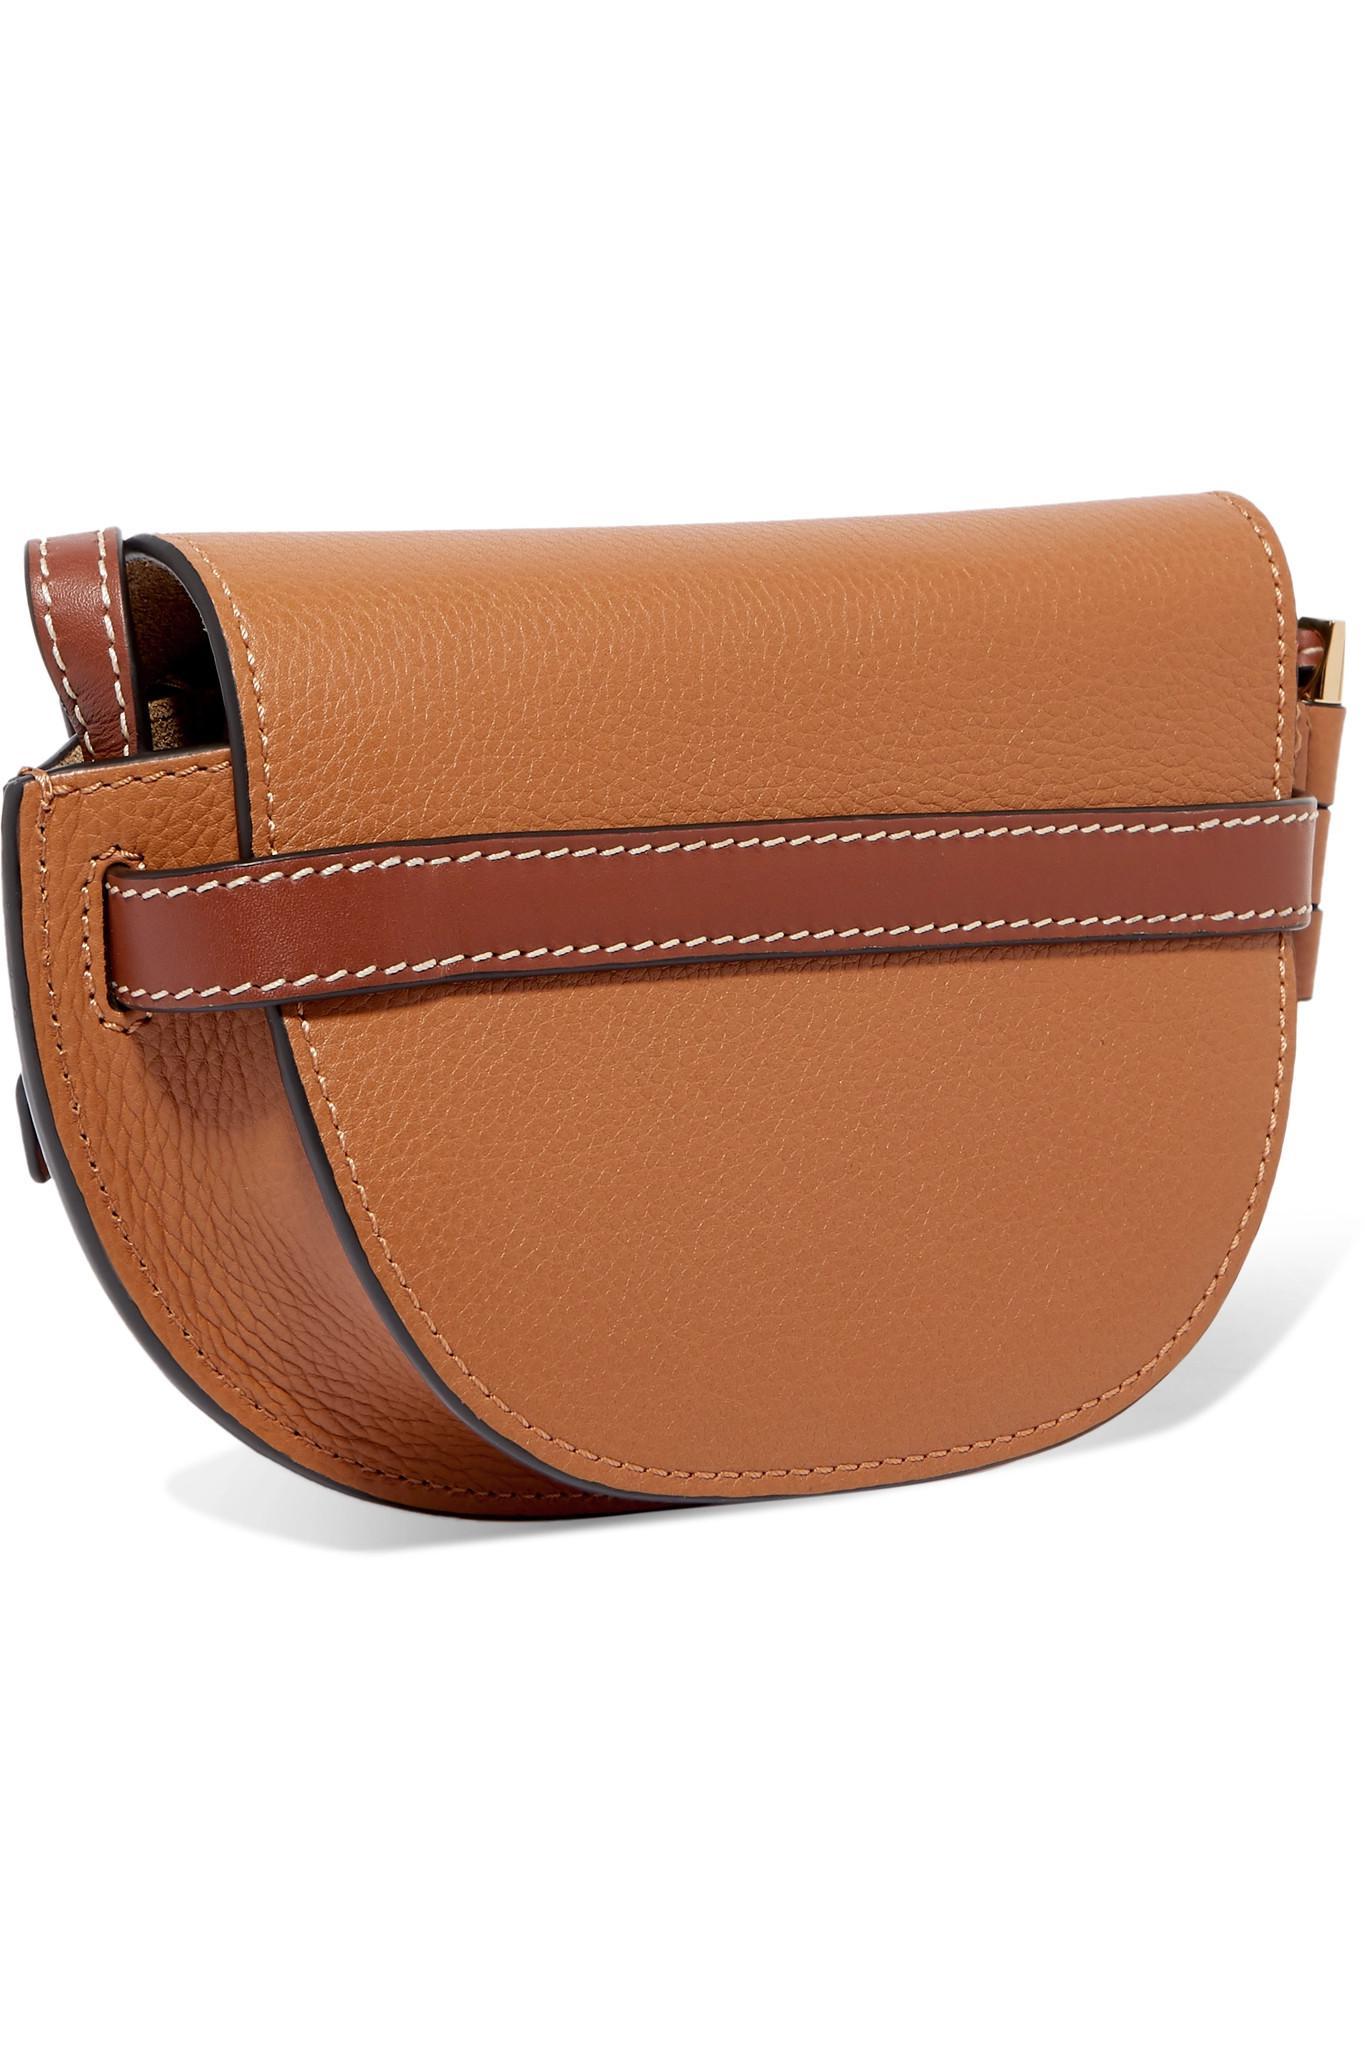 151a6f48267e Loewe - Brown Gate Mini Textured-leather Shoulder Bag - Lyst. View  fullscreen